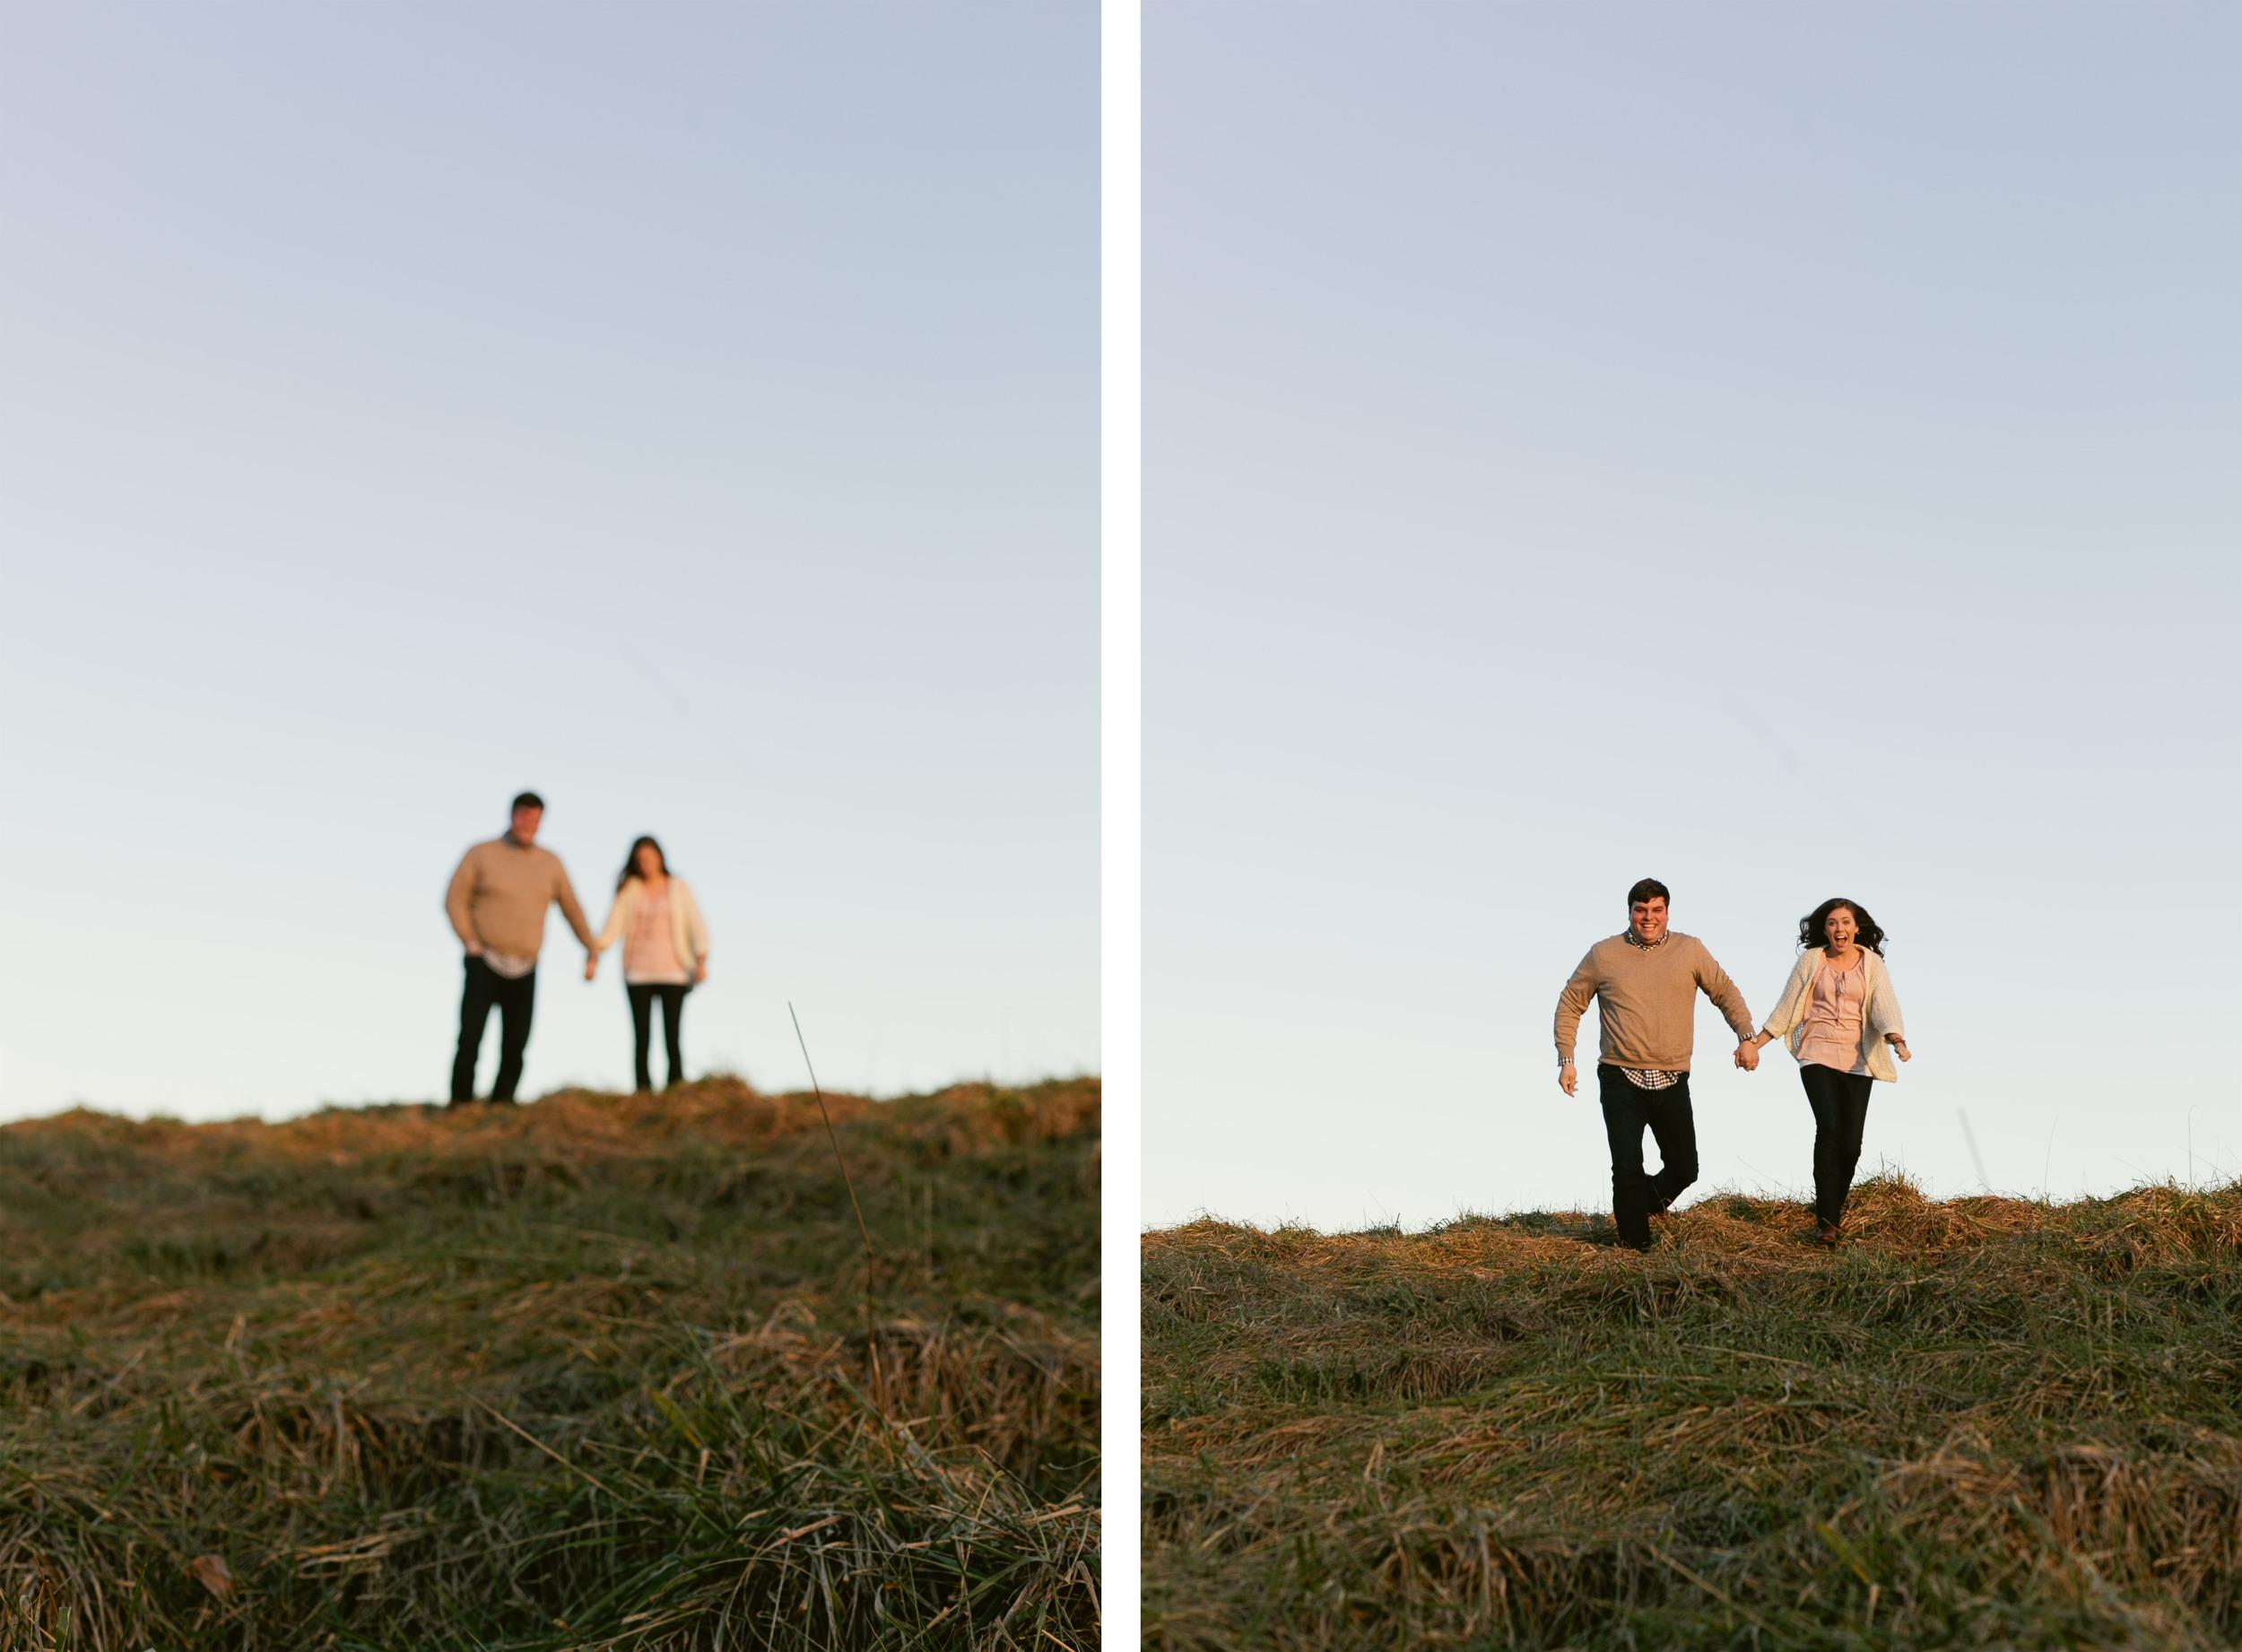 Atlanta-Engagement-Photographer-Kathryn-McCrary-Photography-Anna-Lynn-Raleigh-Collage-6.jpg